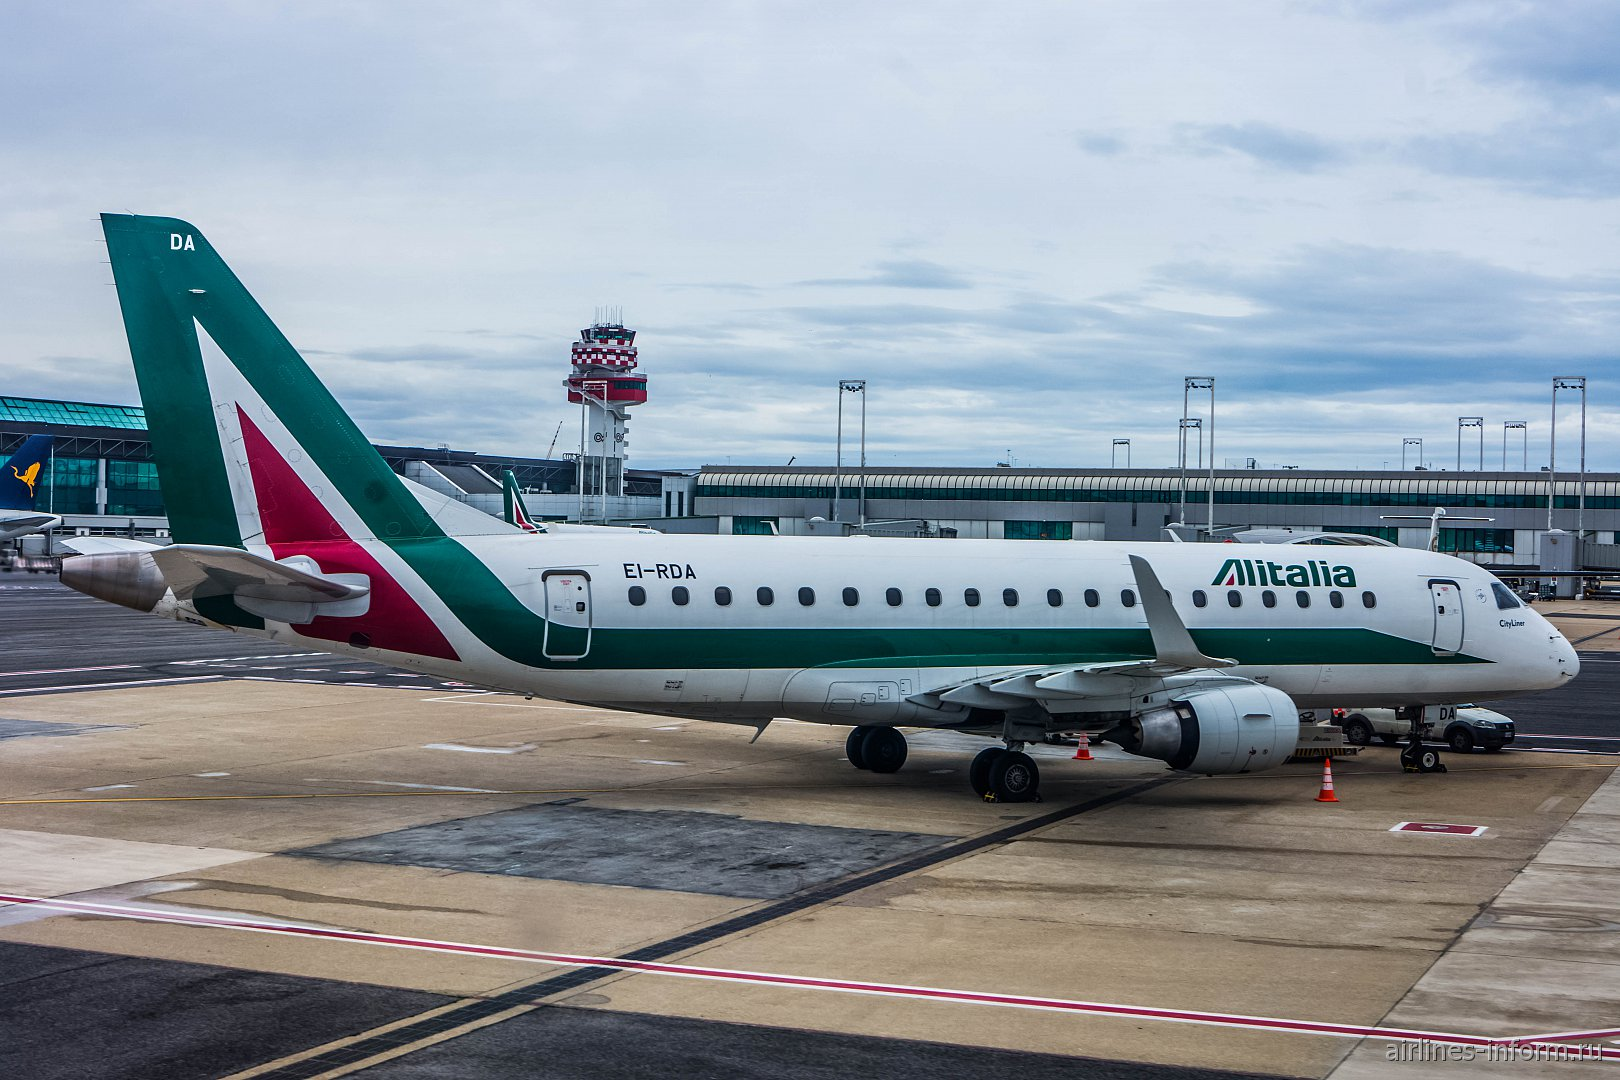 Embraer 175 EI-RDA ������������ Alitalia CityLiner � ��������� ��� ���������